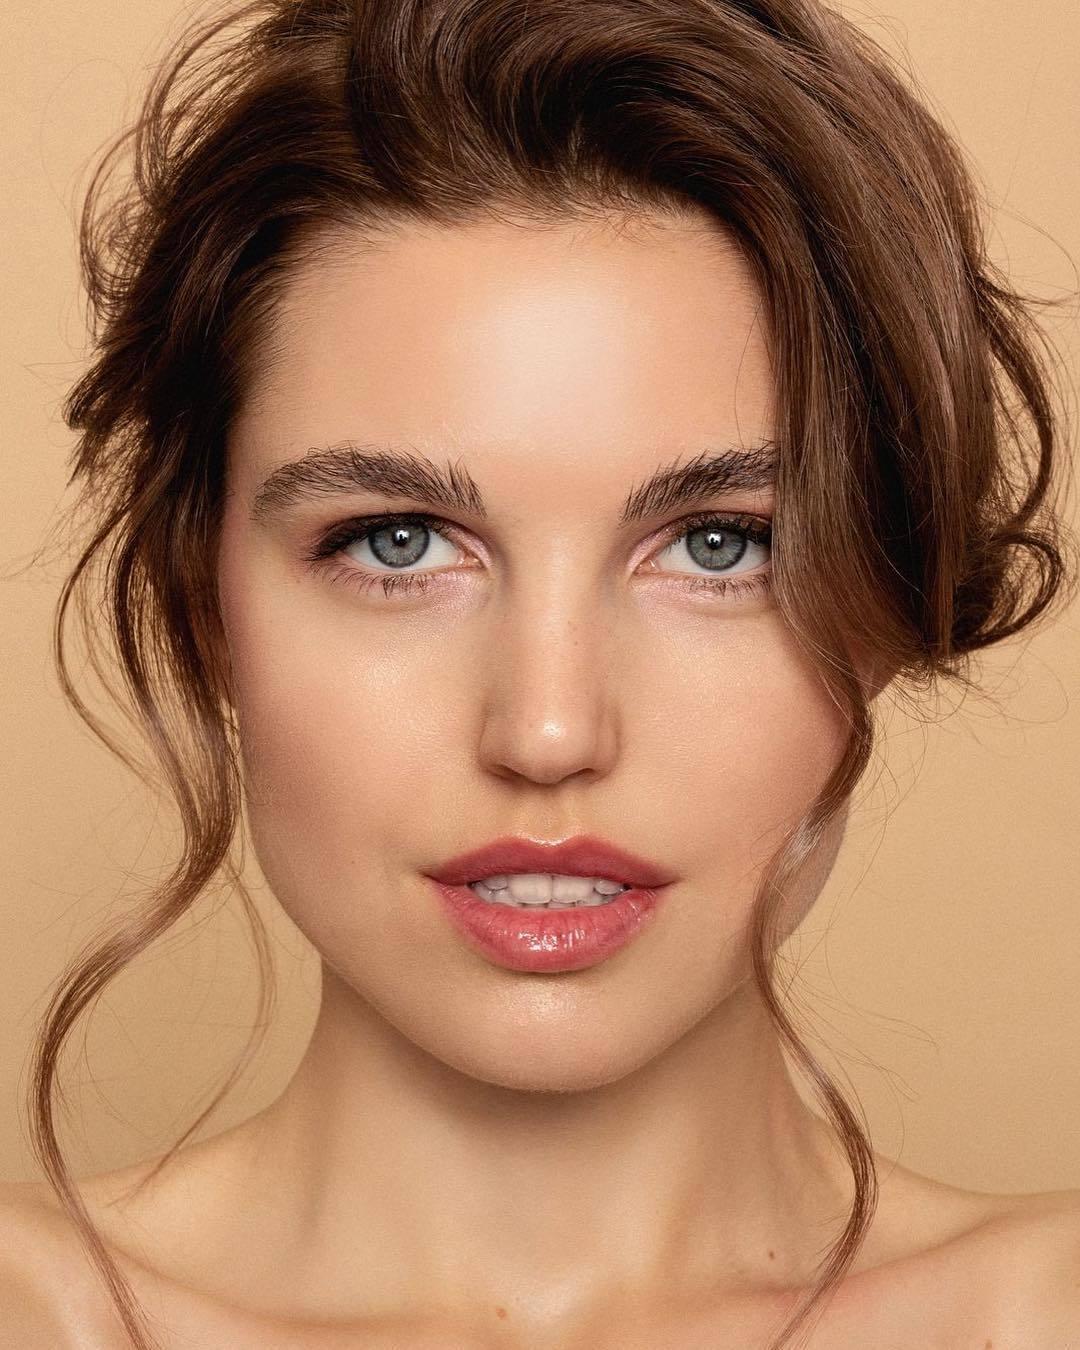 Hoa hậu Slovakia,Hoa hậu Thế giới,Hoa hậu Quốc tế,Hoa hậu Siêu quốc gia